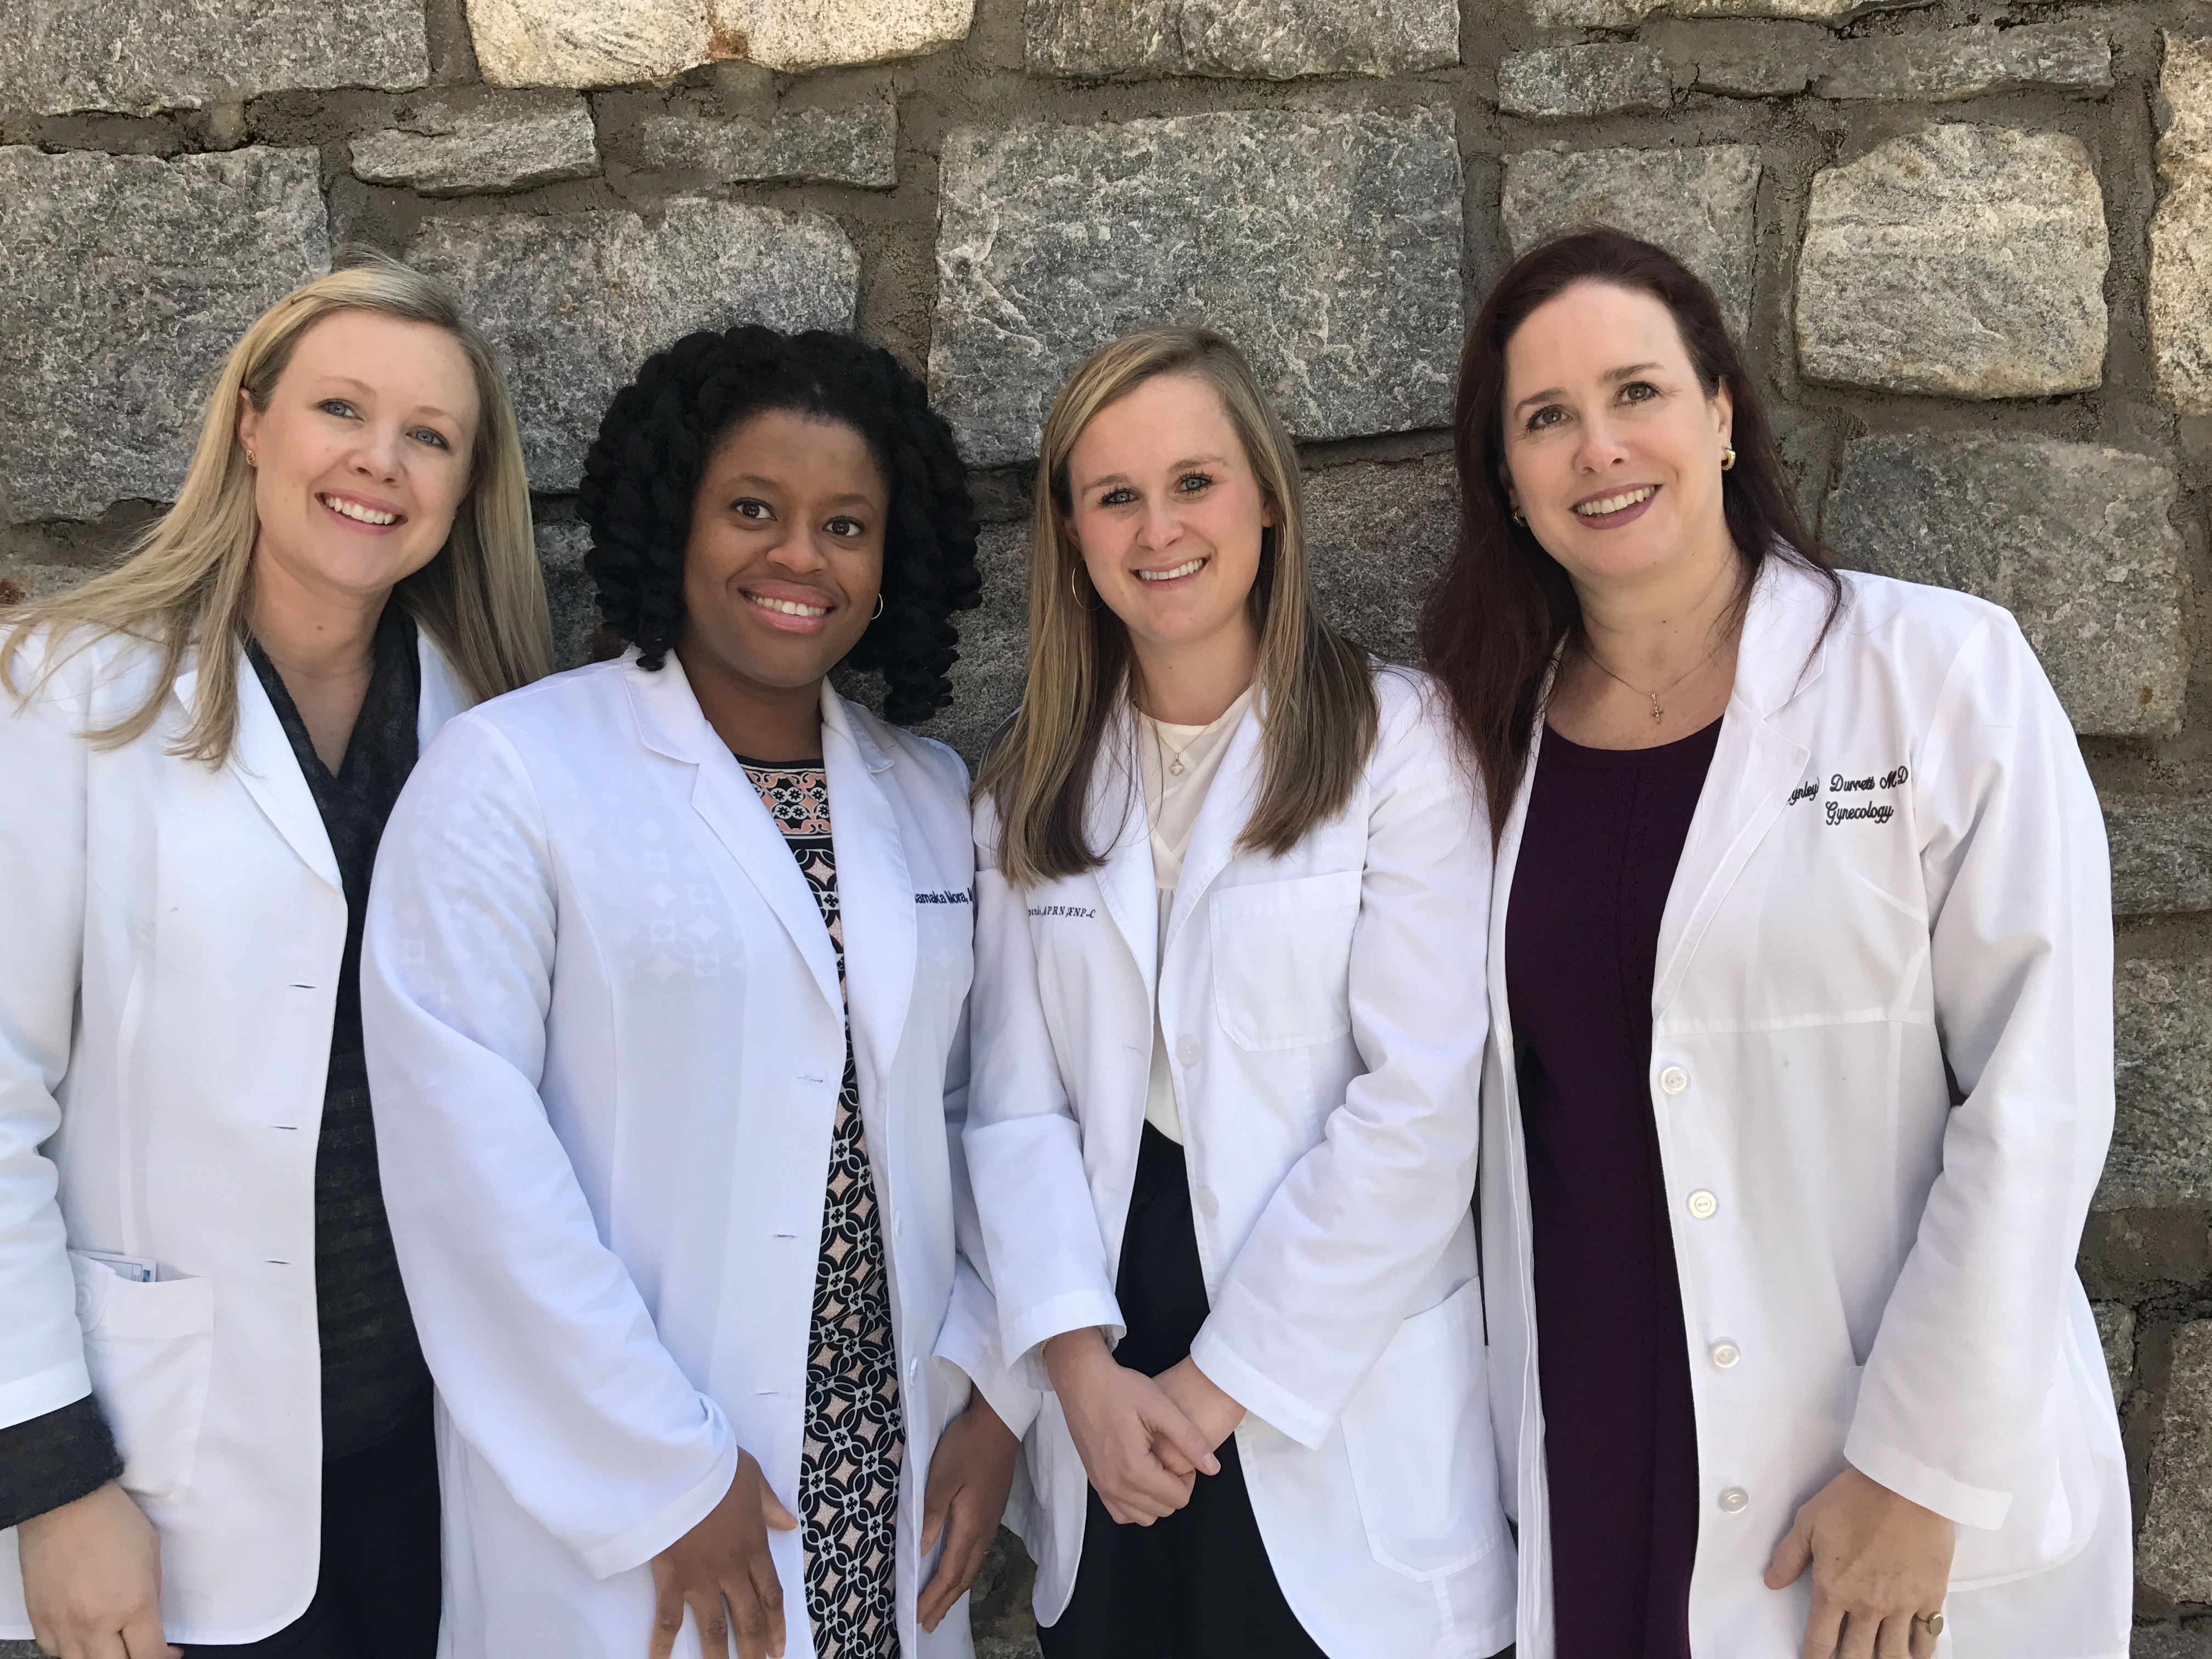 Atlanta Gynecology Practice Celebrates 30 Years of Serving